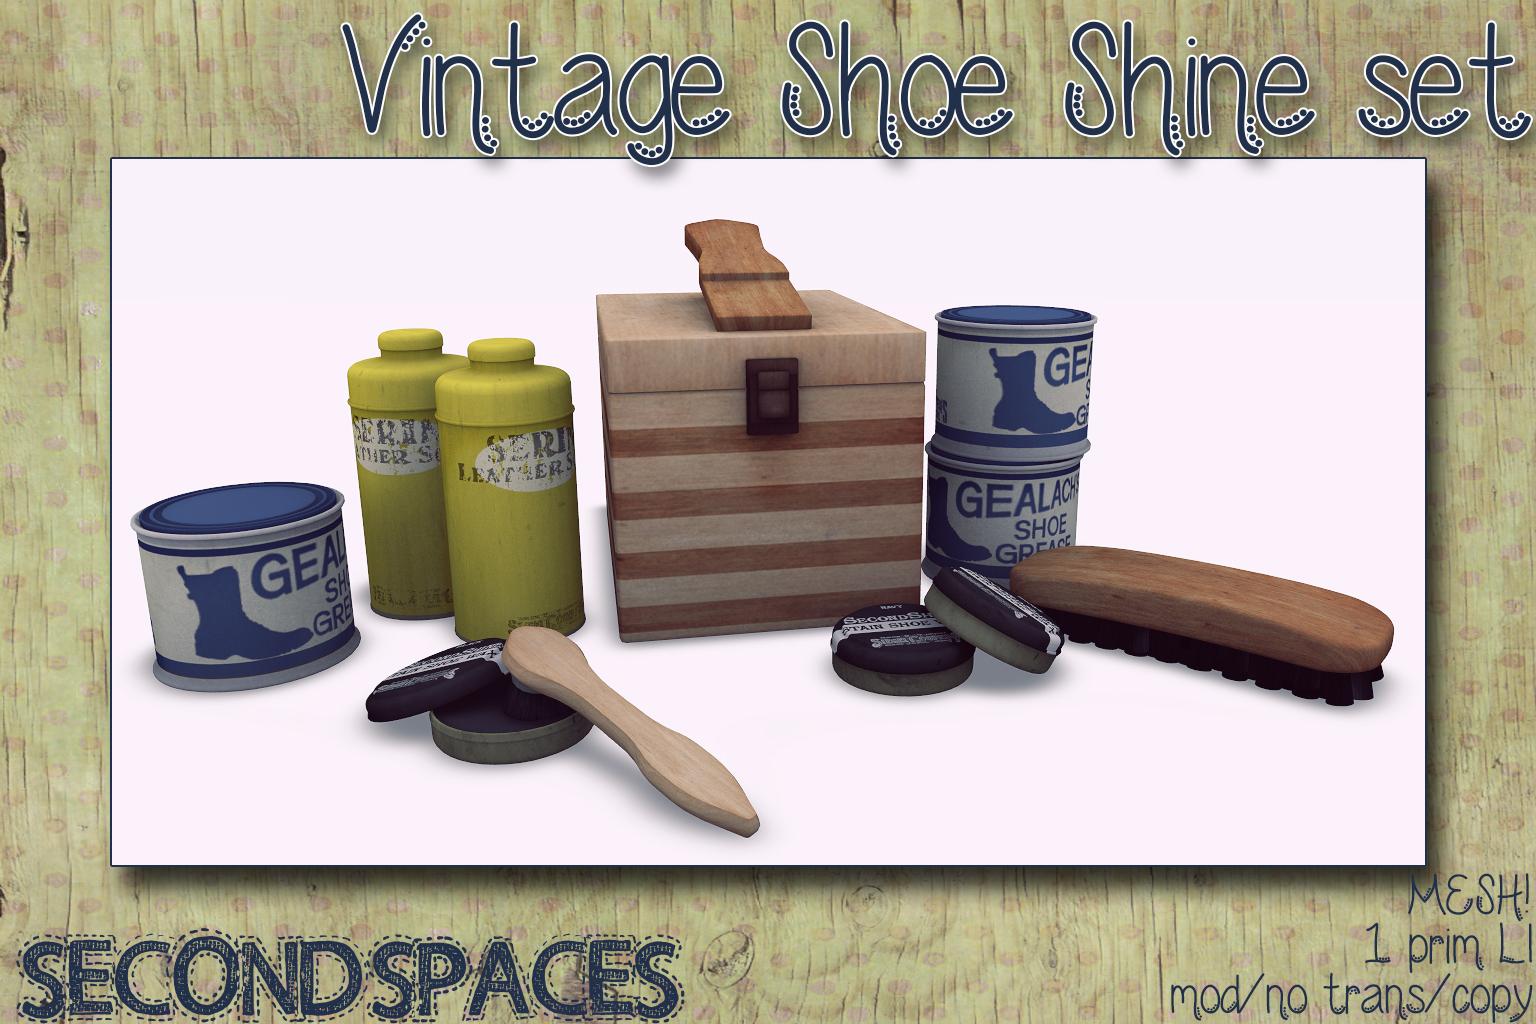 vintage shoe shine_vendor.jpg